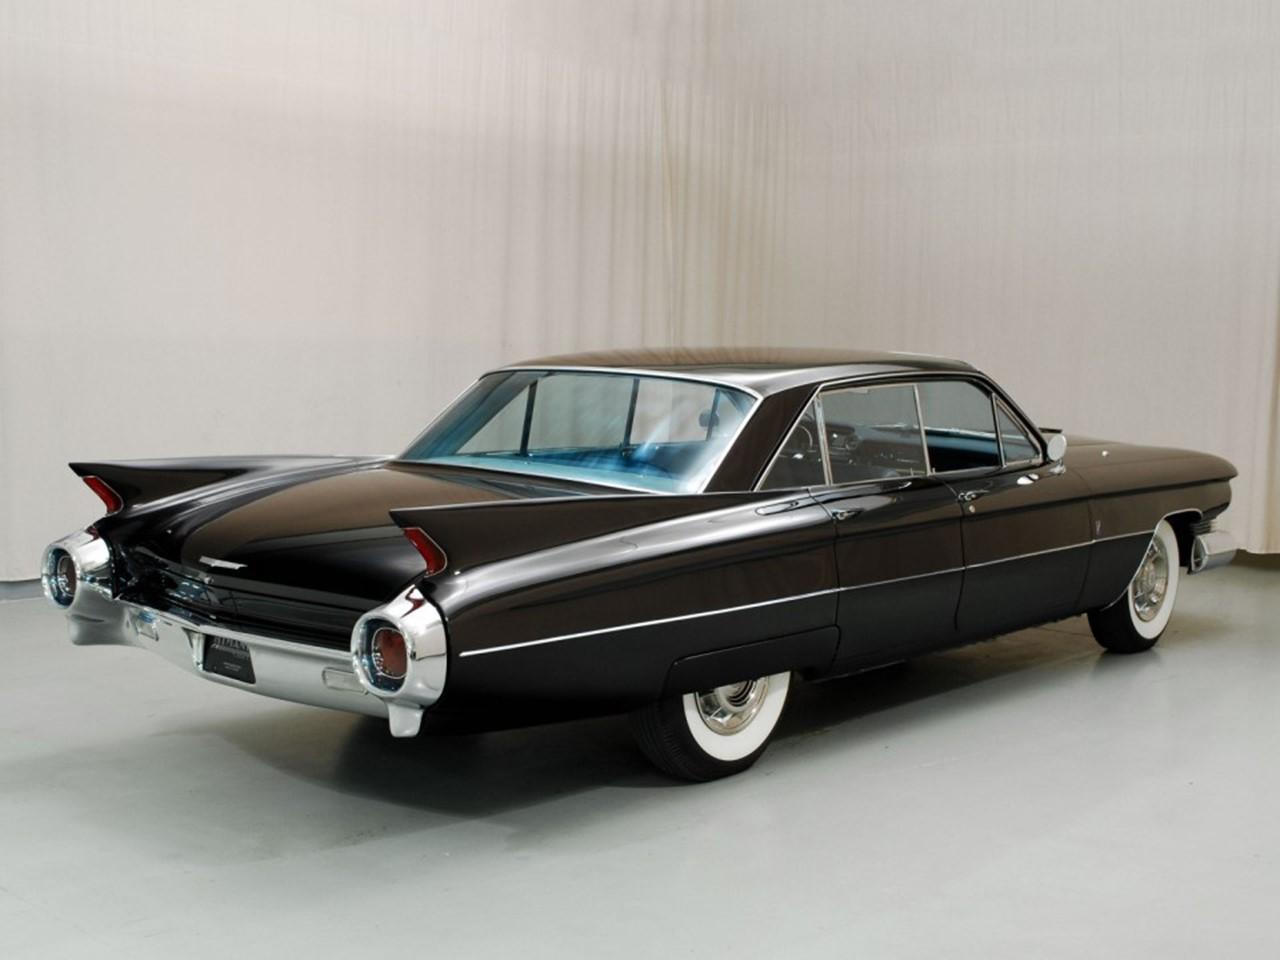 The Elite 1960 Cadillac Series 6900 Eldorado Brougham Notoriousluxury 1961 Fleetwood Engine 1959